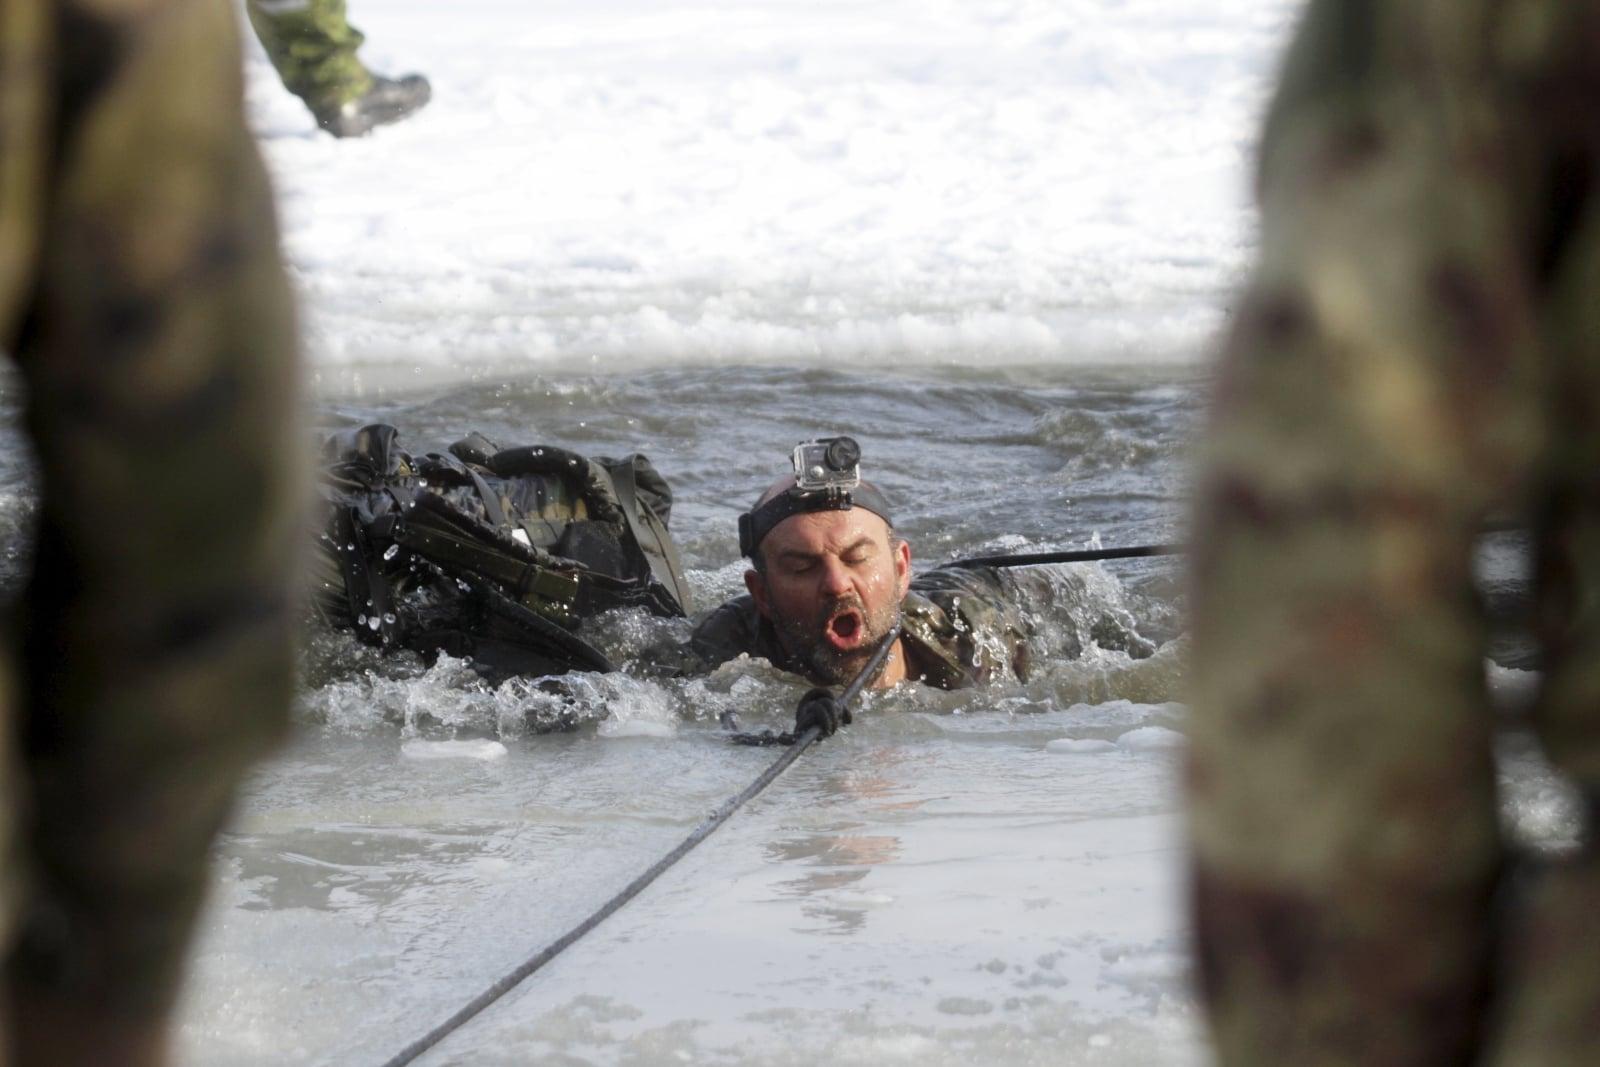 Ćwiczenia NATO na Litwie EPA/VALDA KALNINA